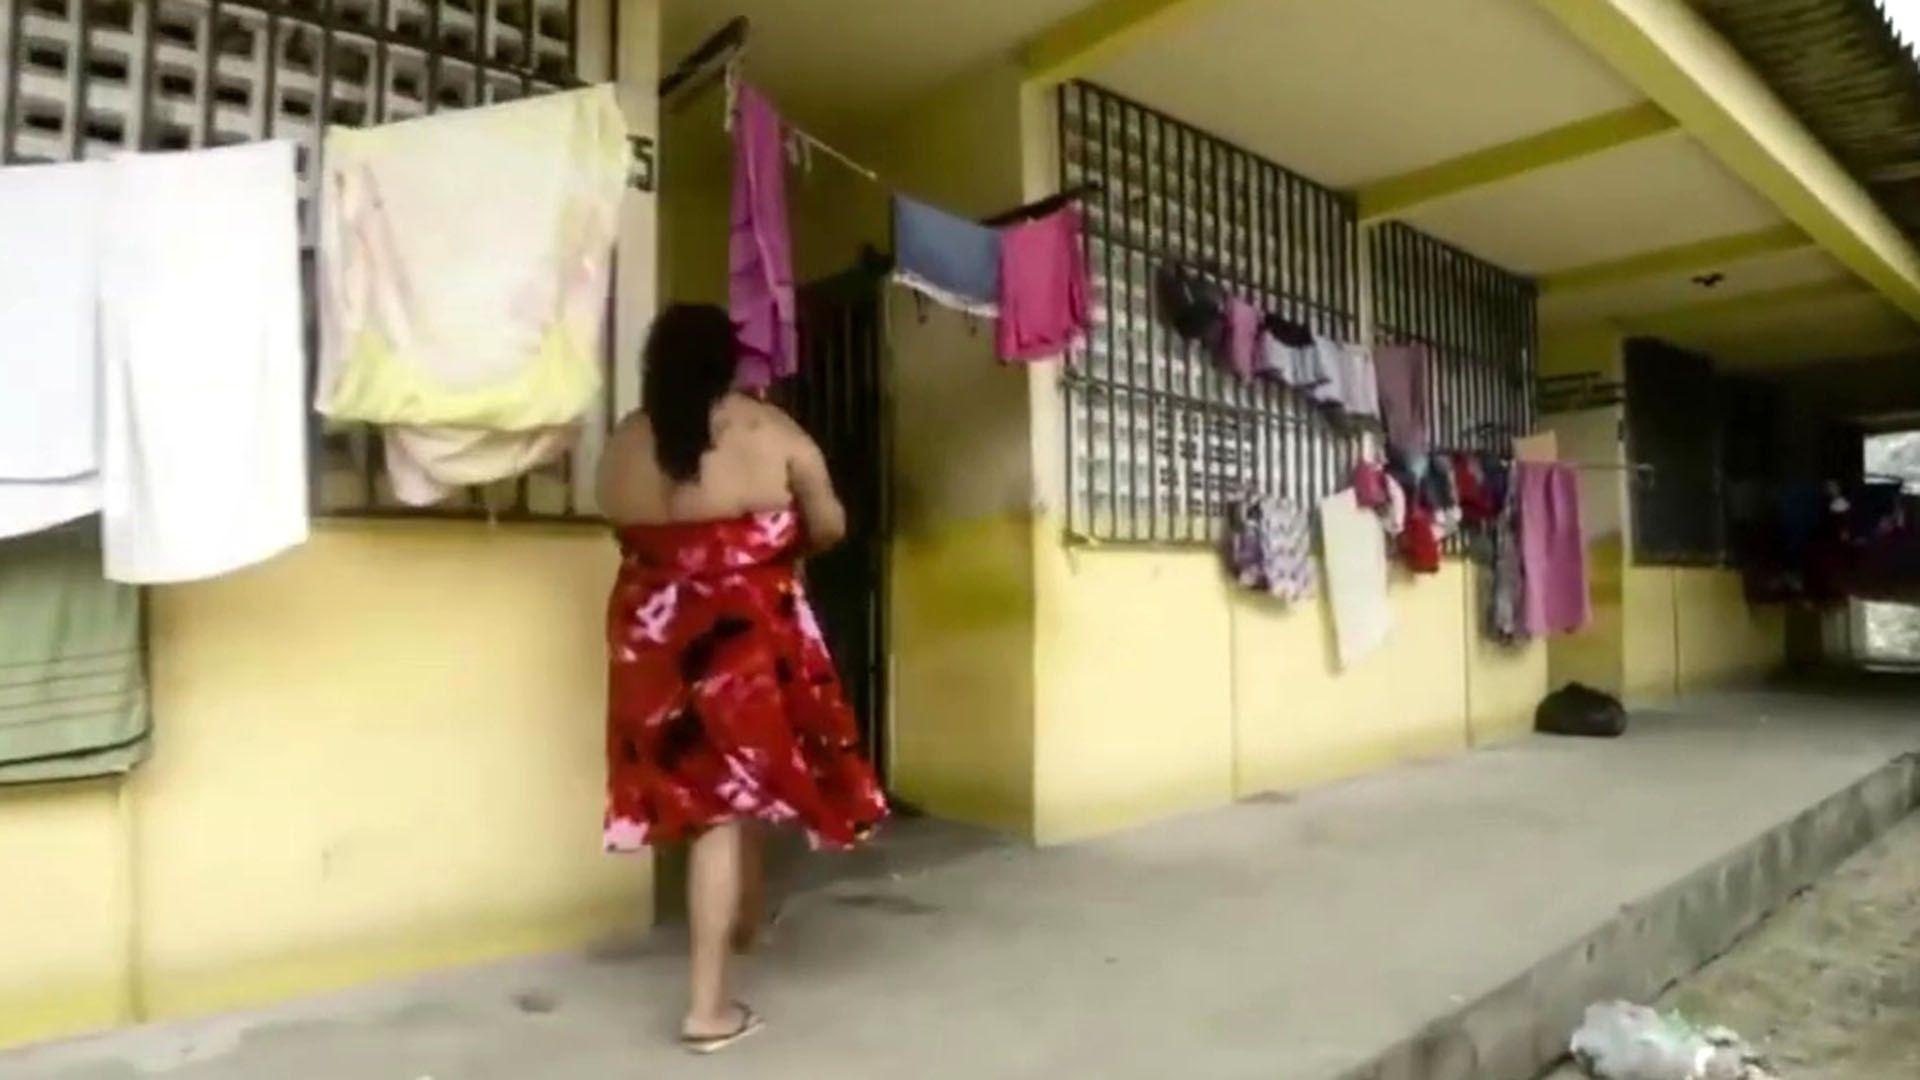 carcel de mujeres brasil captura